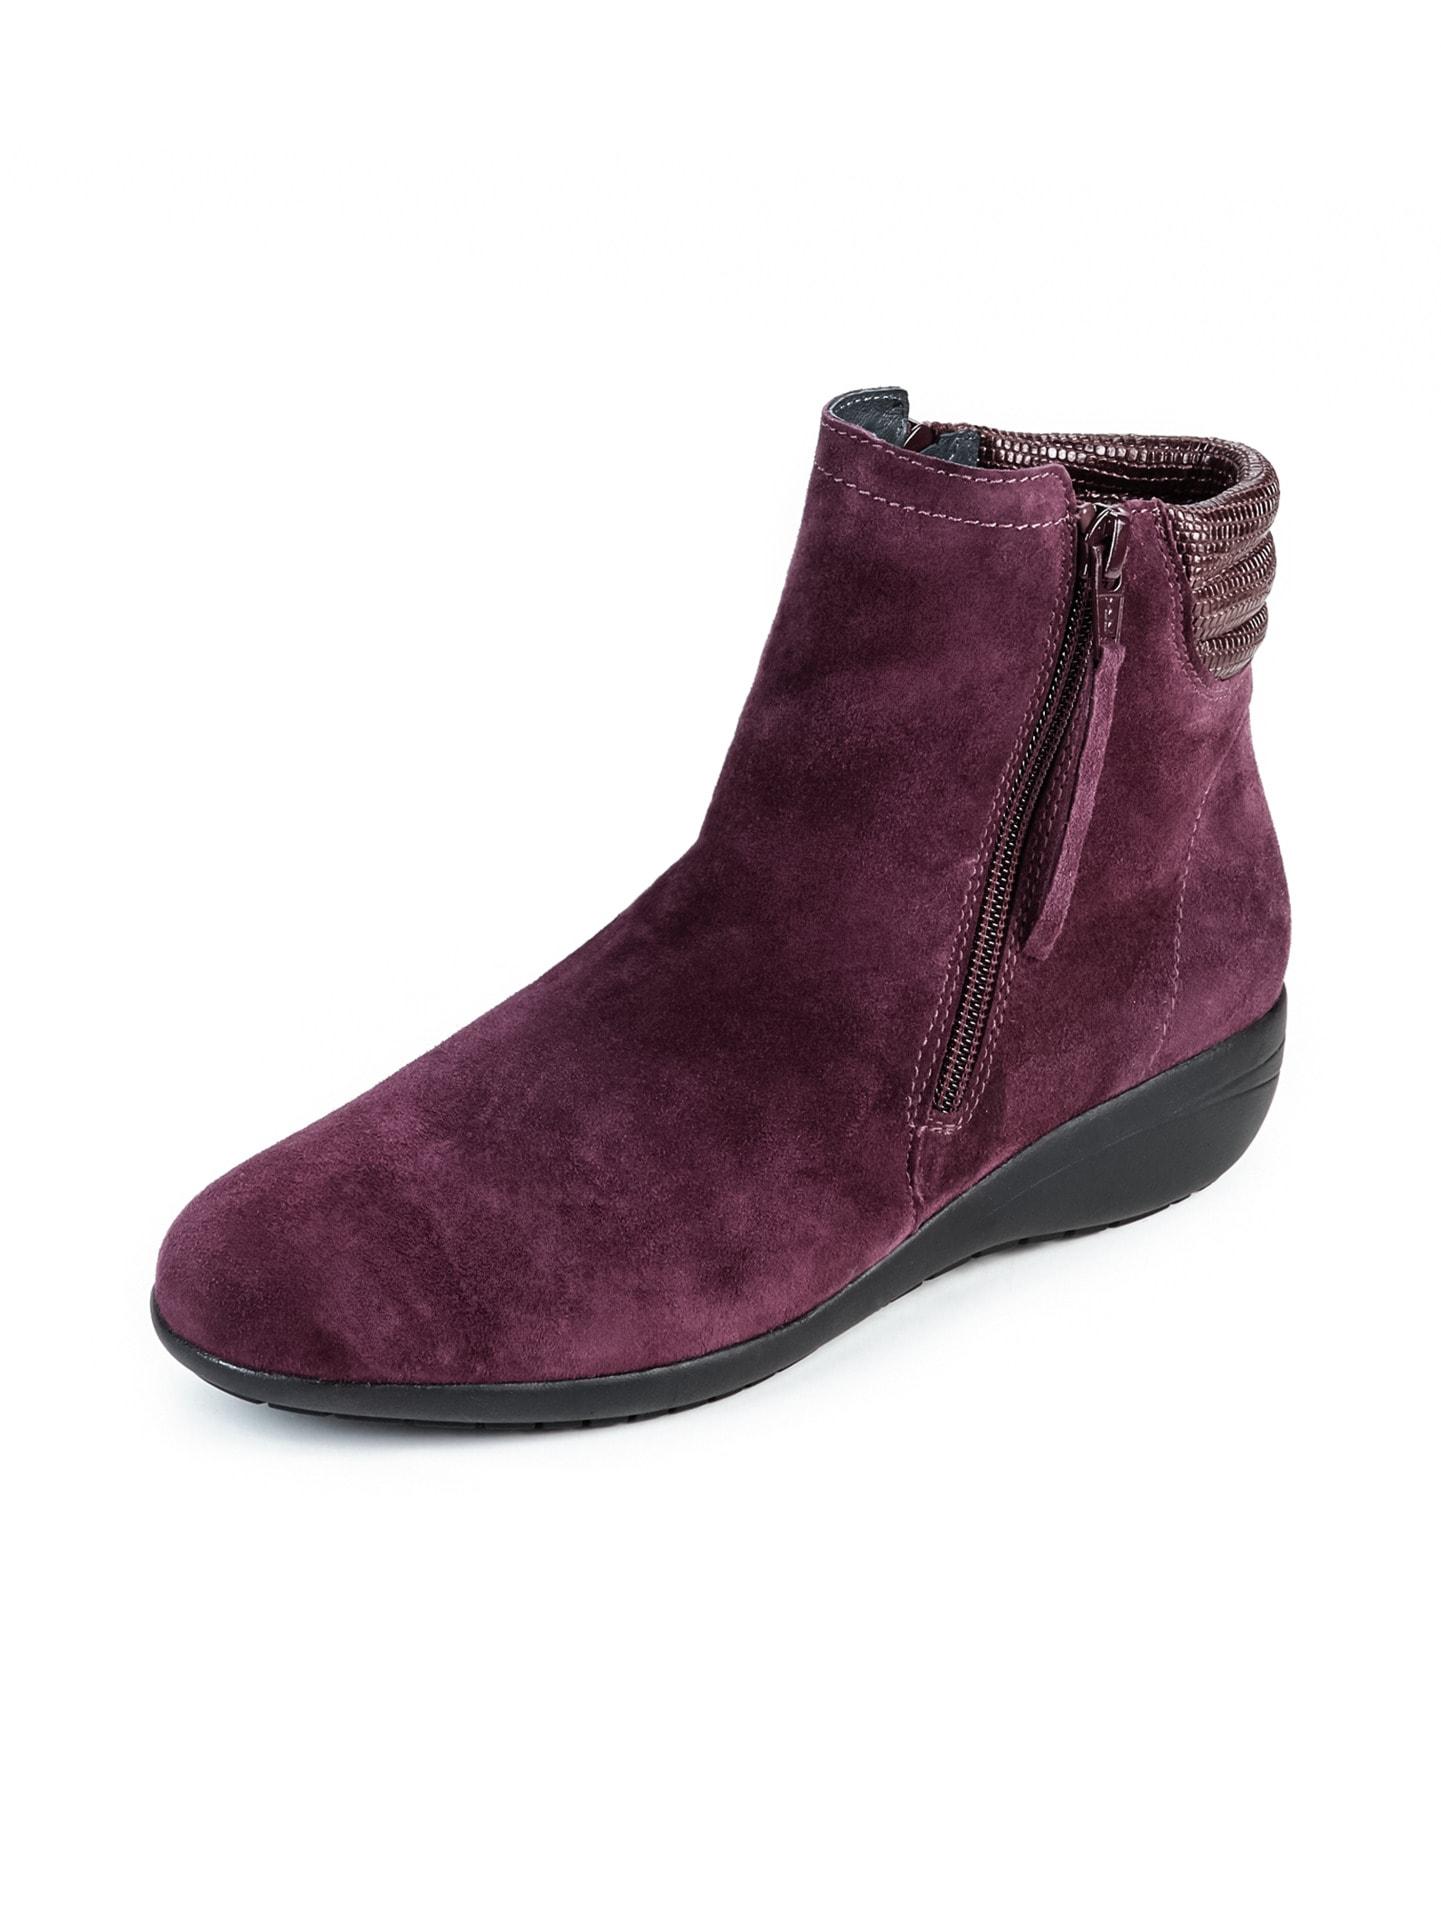 Avena Damen Hallux-Stiefelette Soft & Easy Rot 45-7726-5